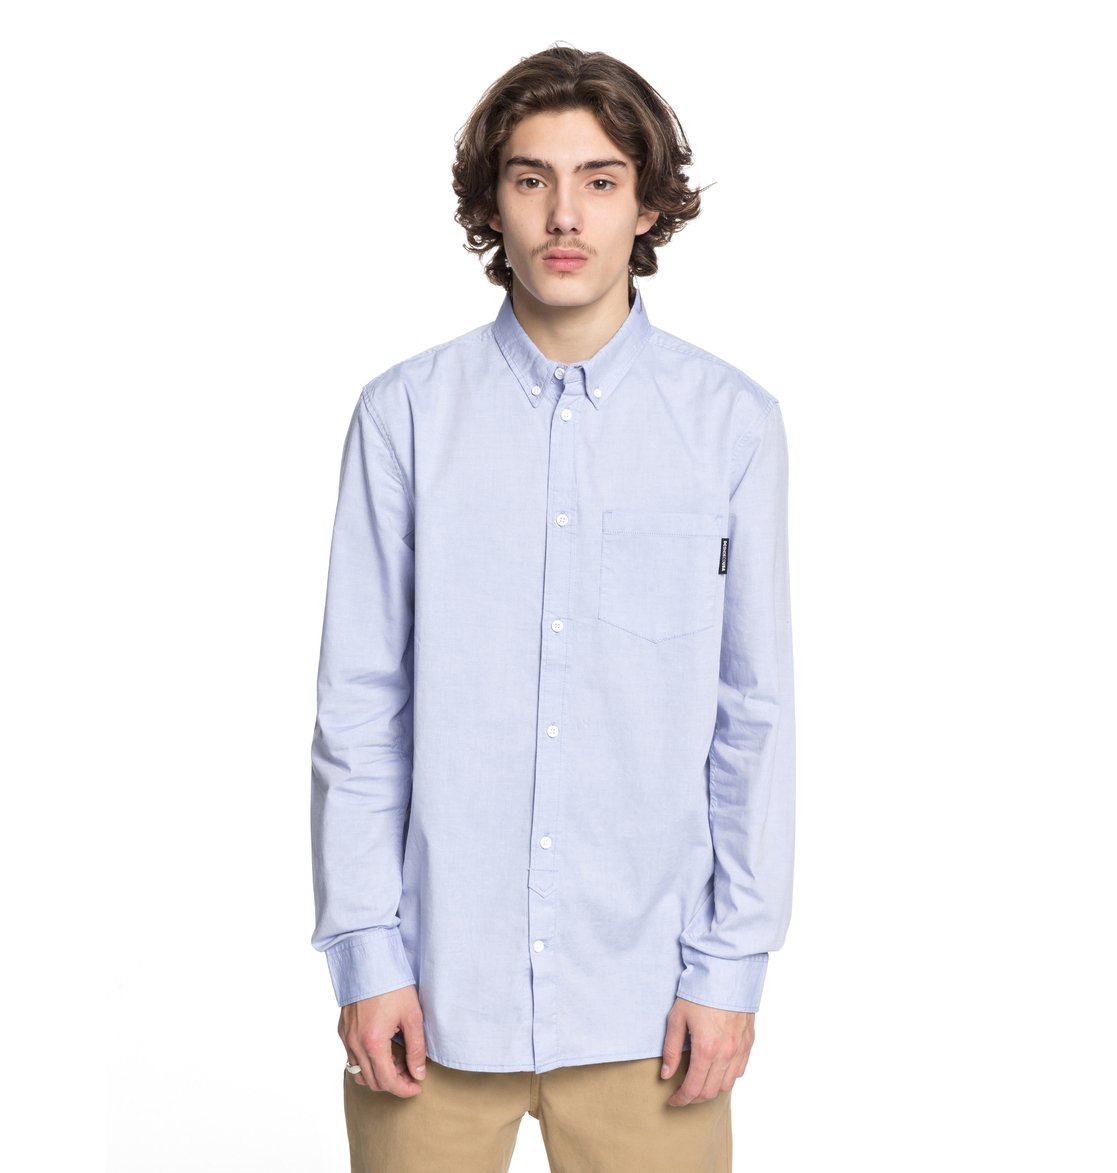 DC-Shoes-Classic-Oxford-Light-Camisa-de-Manga-Larga-para-Hombre-EDYWT03183